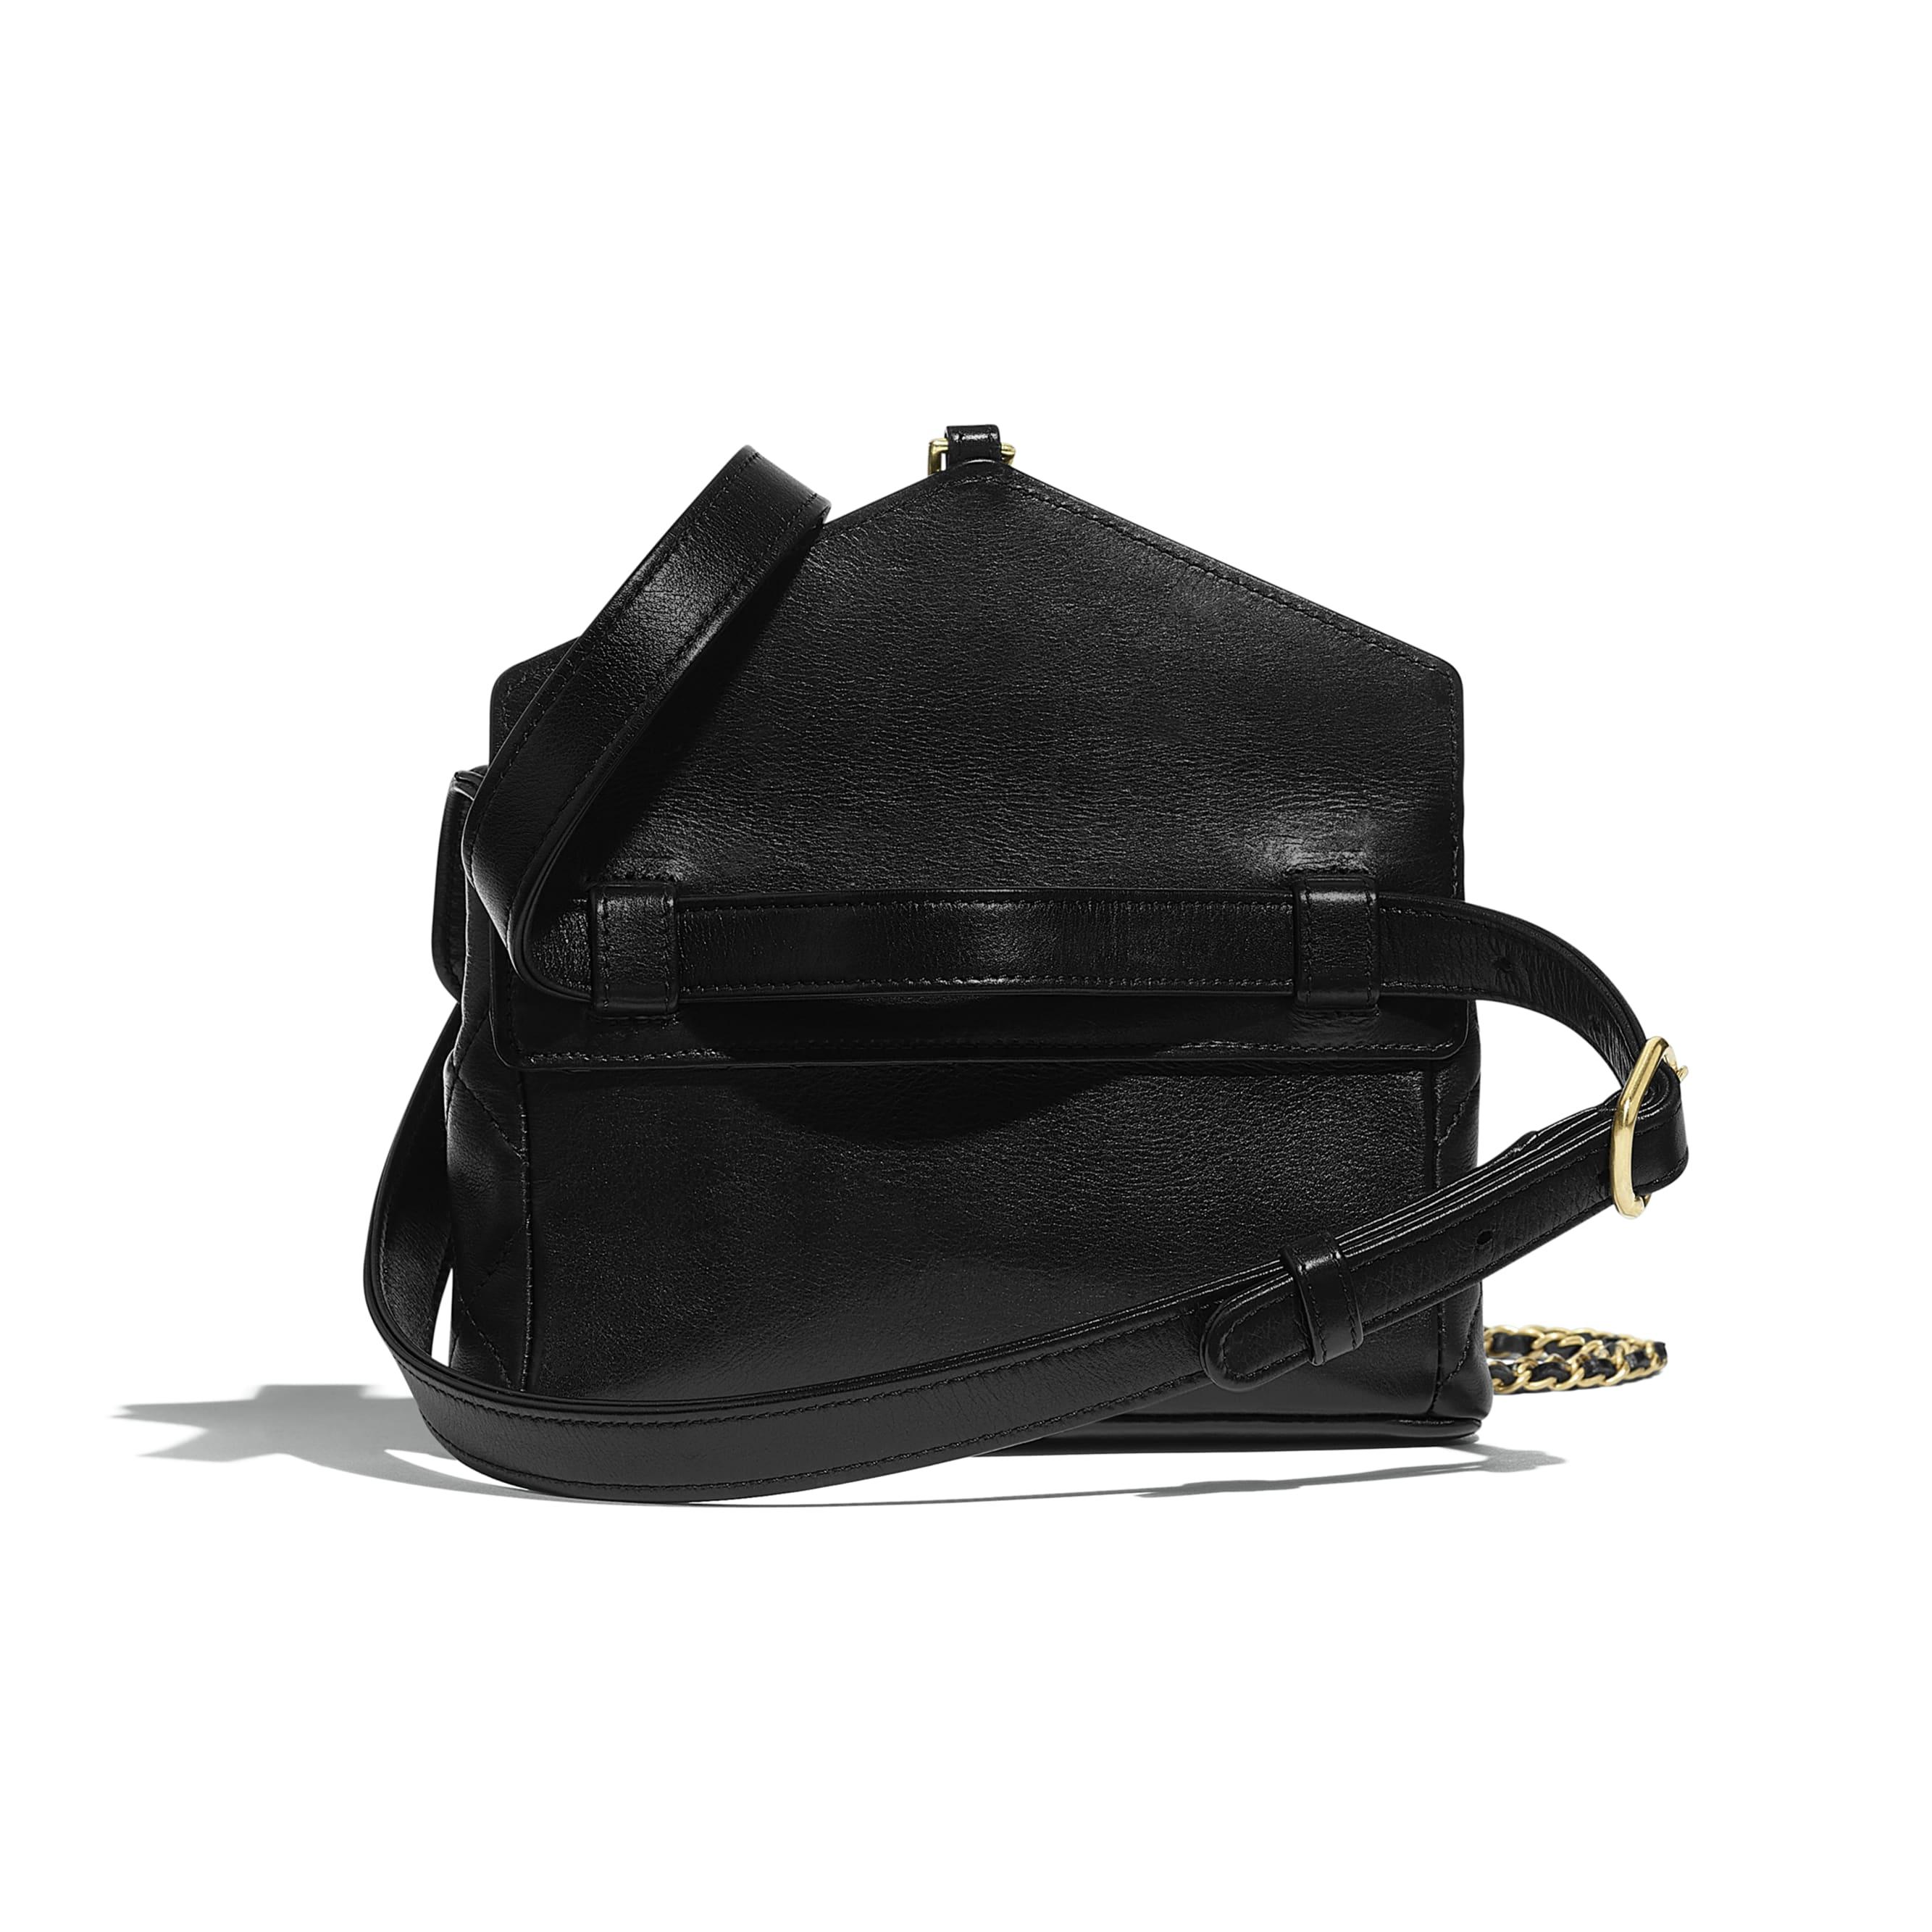 Waist Bag - Black - Calfskin & Gold-Tone Metal - Alternative view - see standard sized version